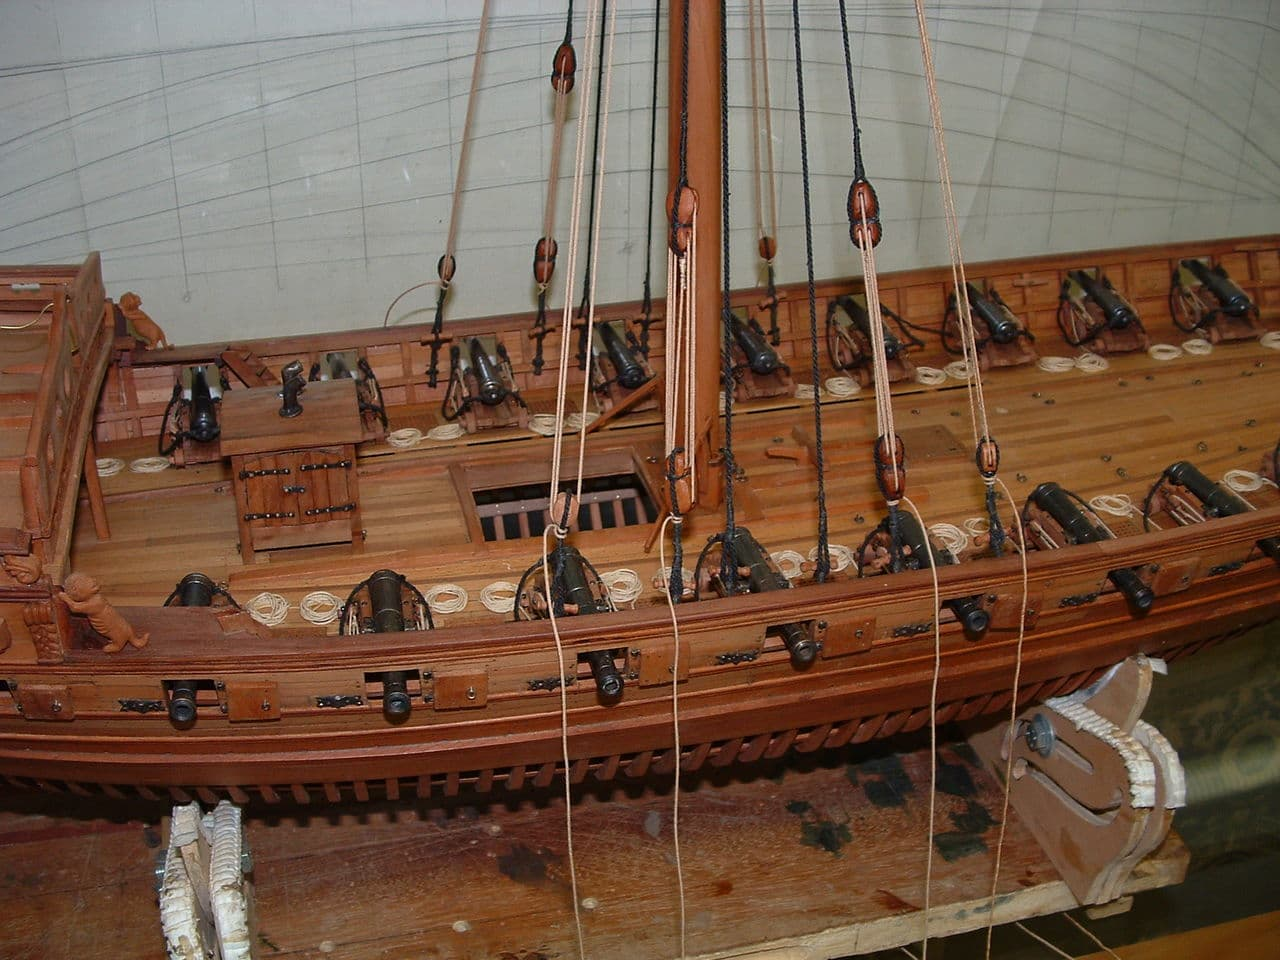 Chebec Le Requin - 1750 1226